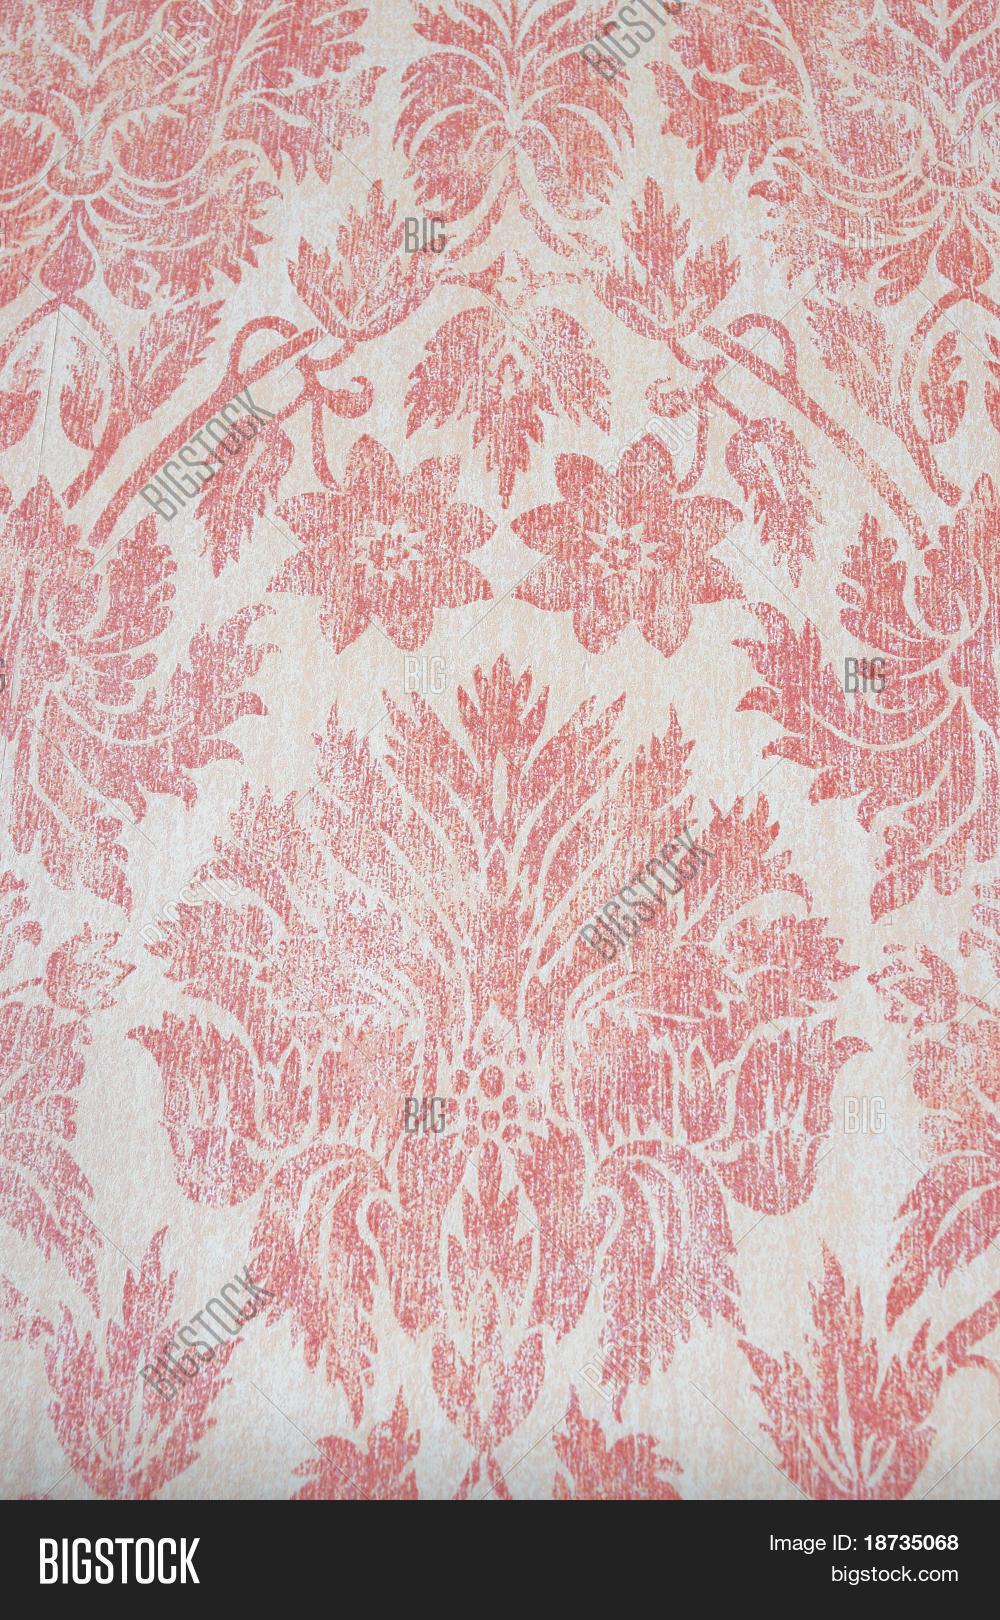 Vintage Pink Floral Image Photo Free Trial Bigstock